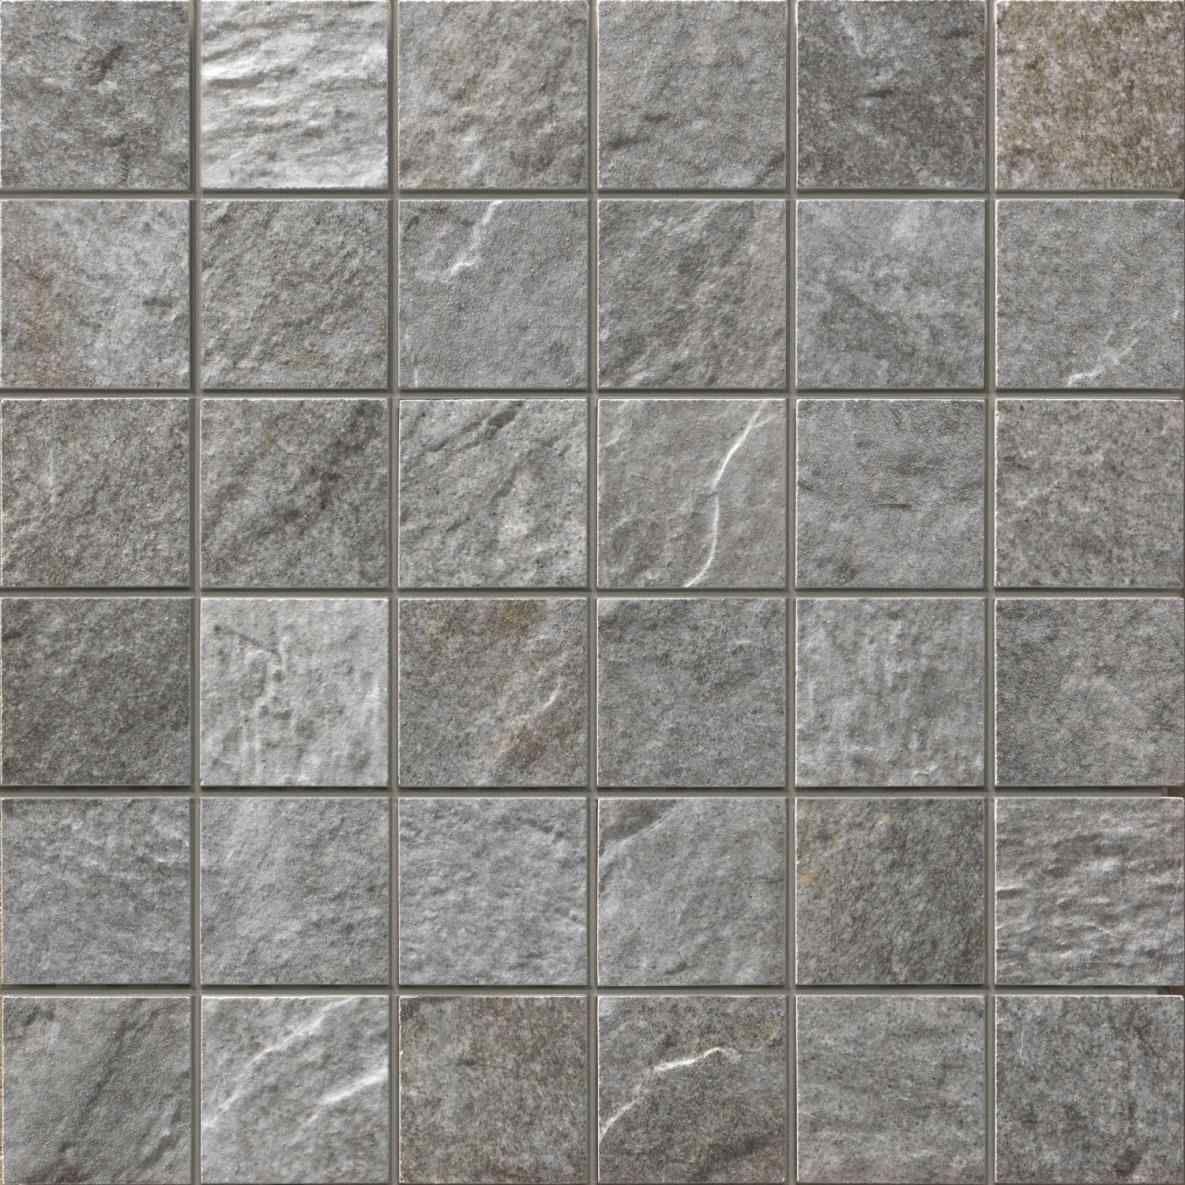 Pin by Martin on Texture Tile floor, Gray tile bathroom